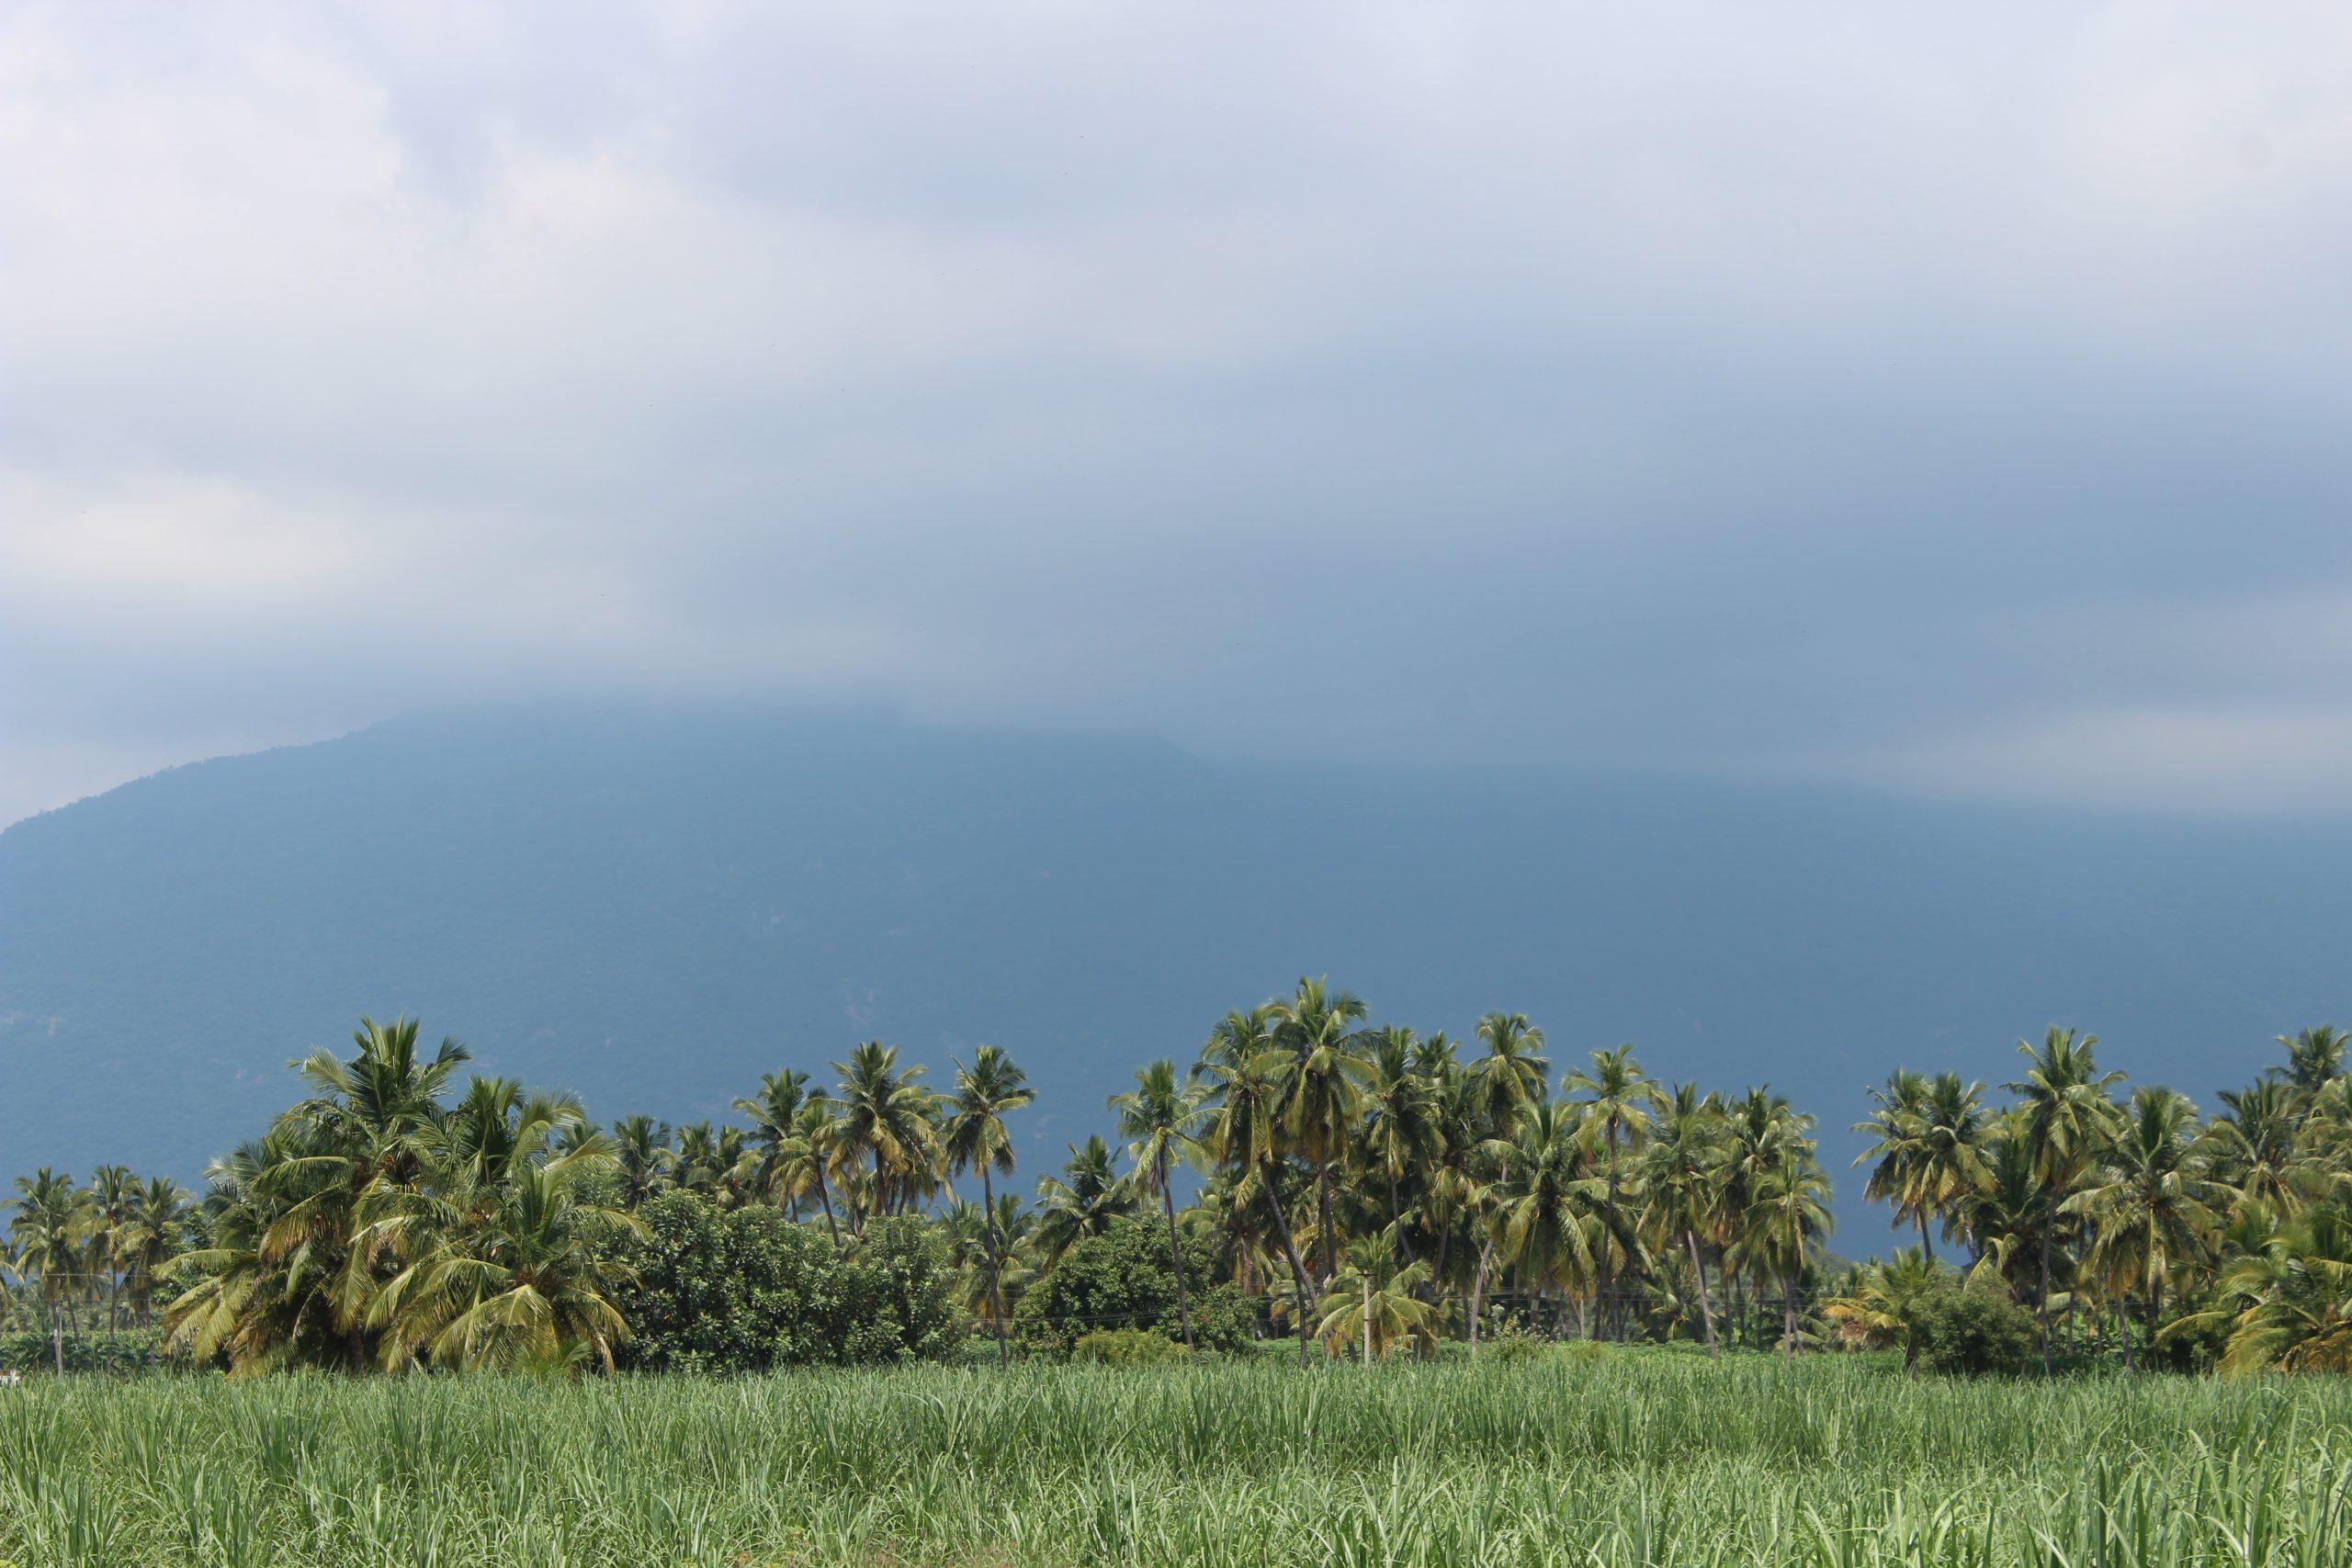 Grassland and Trees